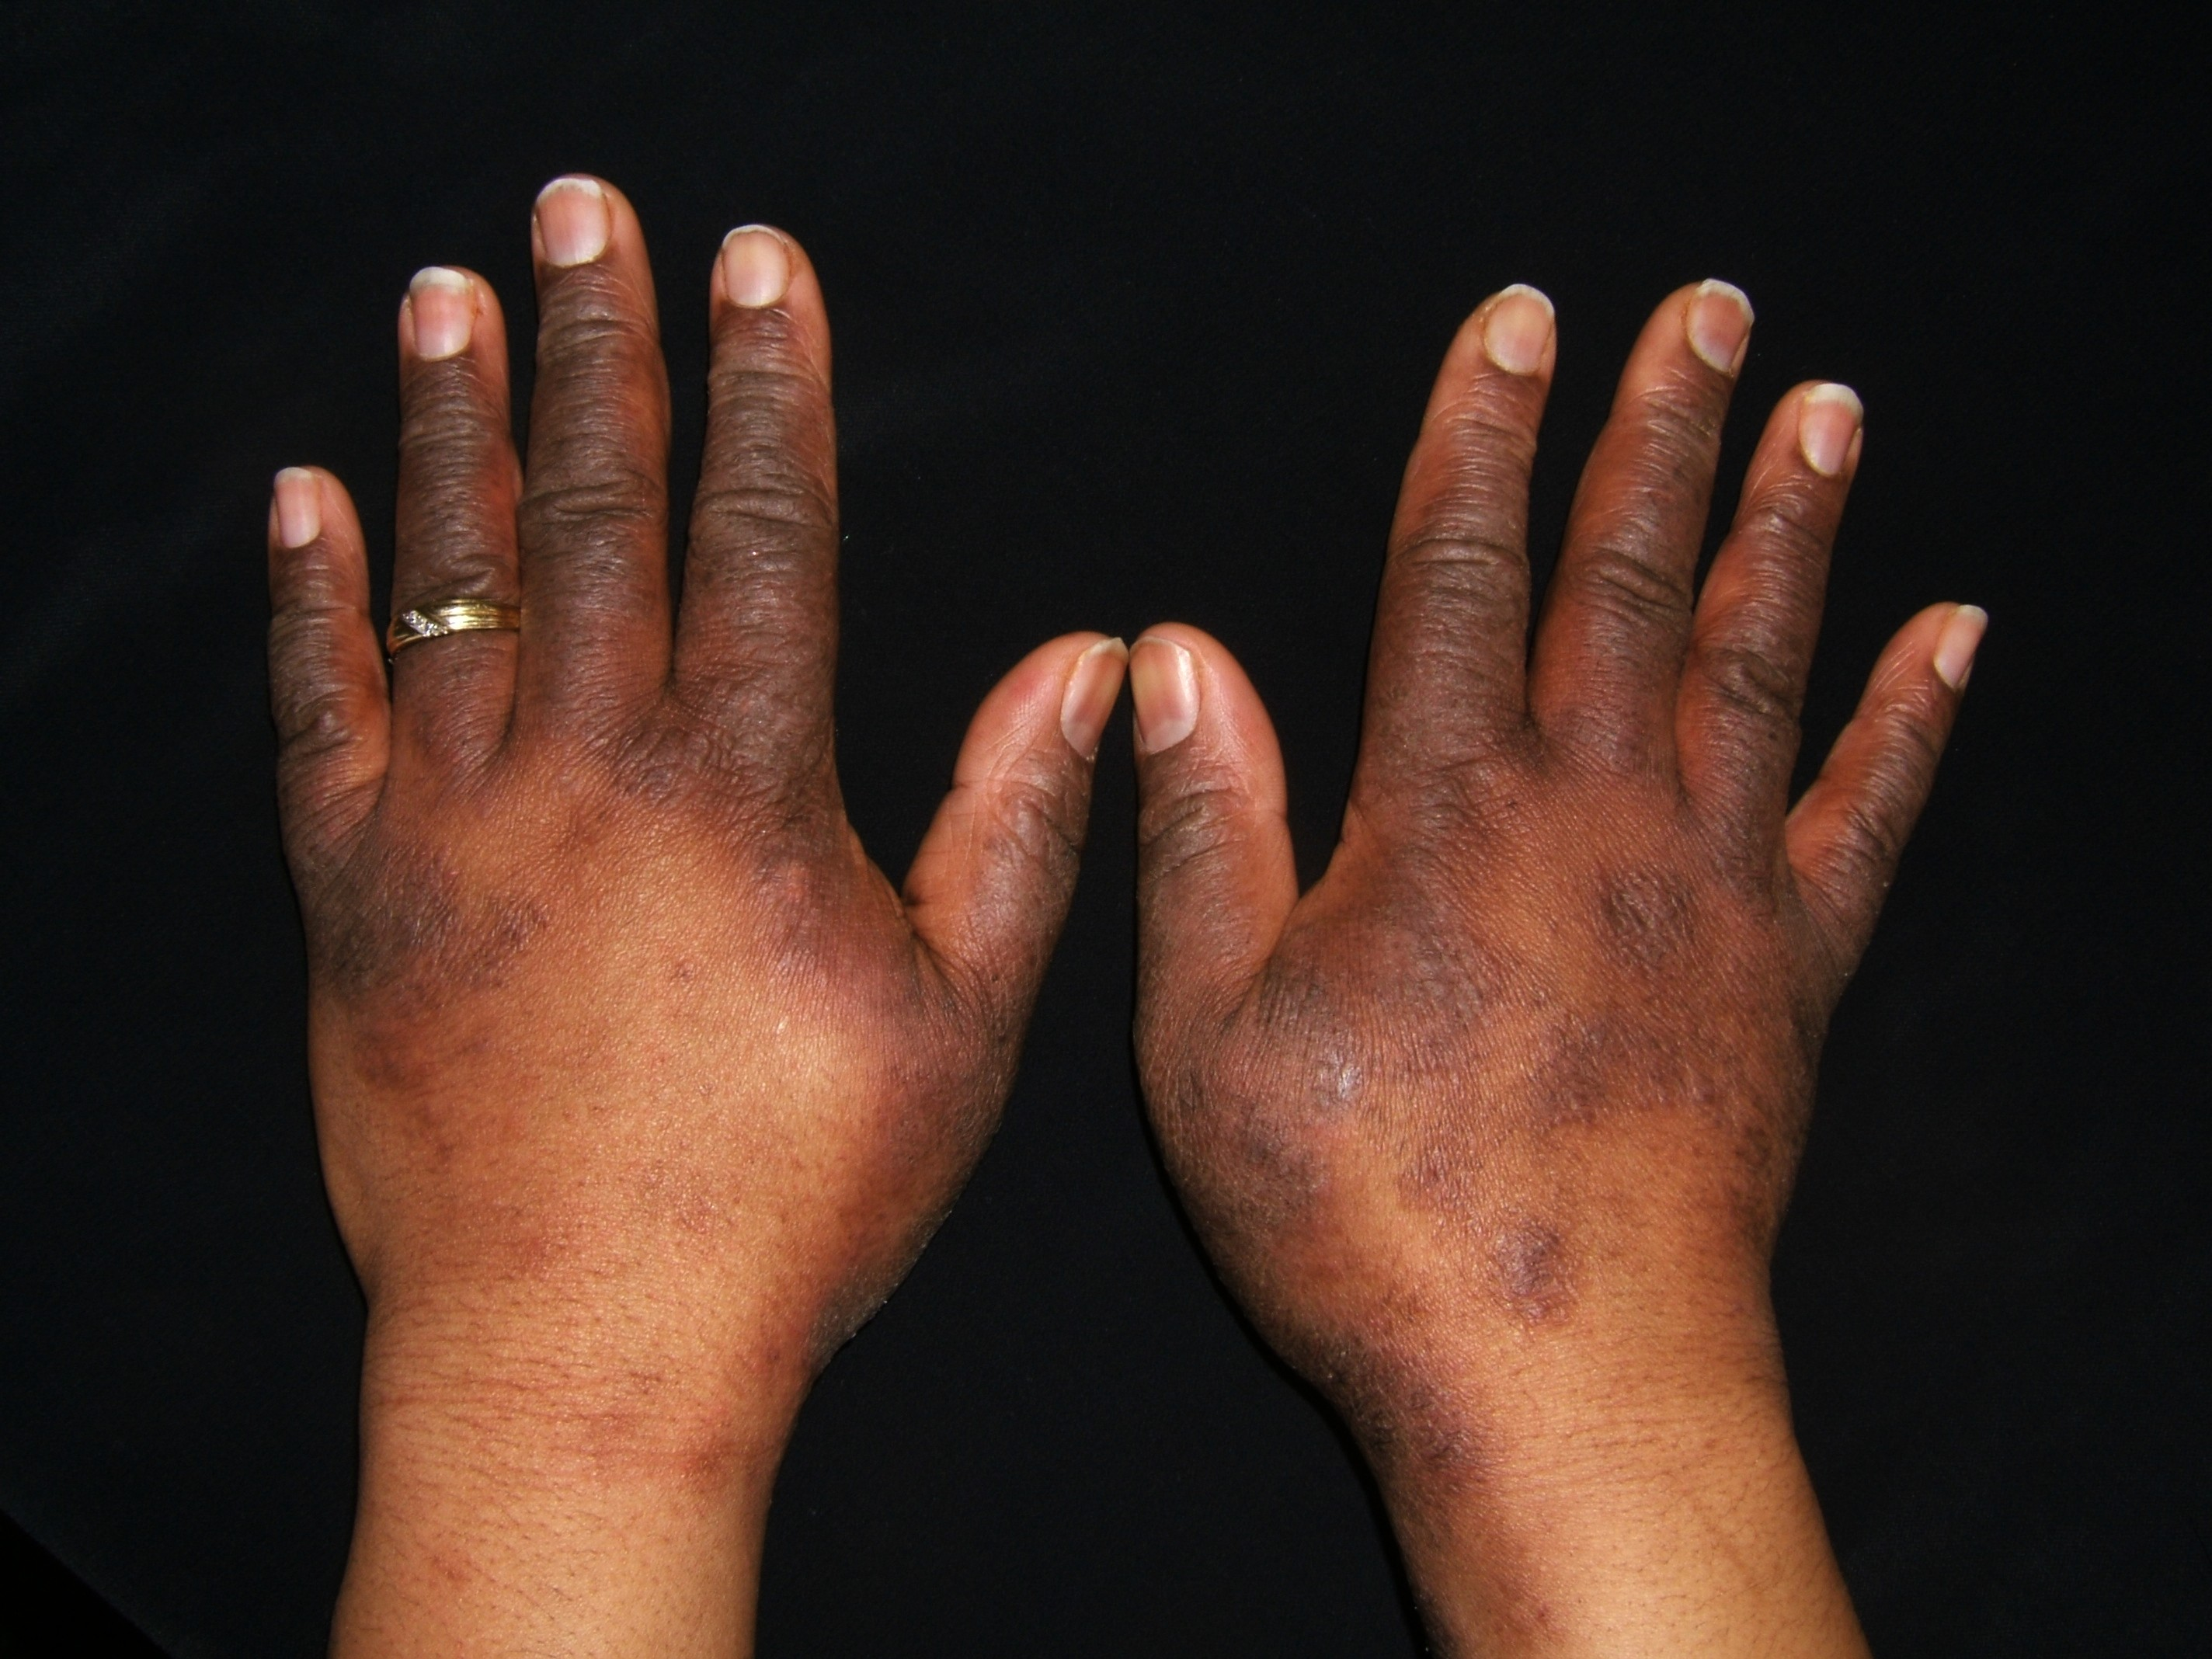 Eczema Symptoms & Causes   National Eczema Association